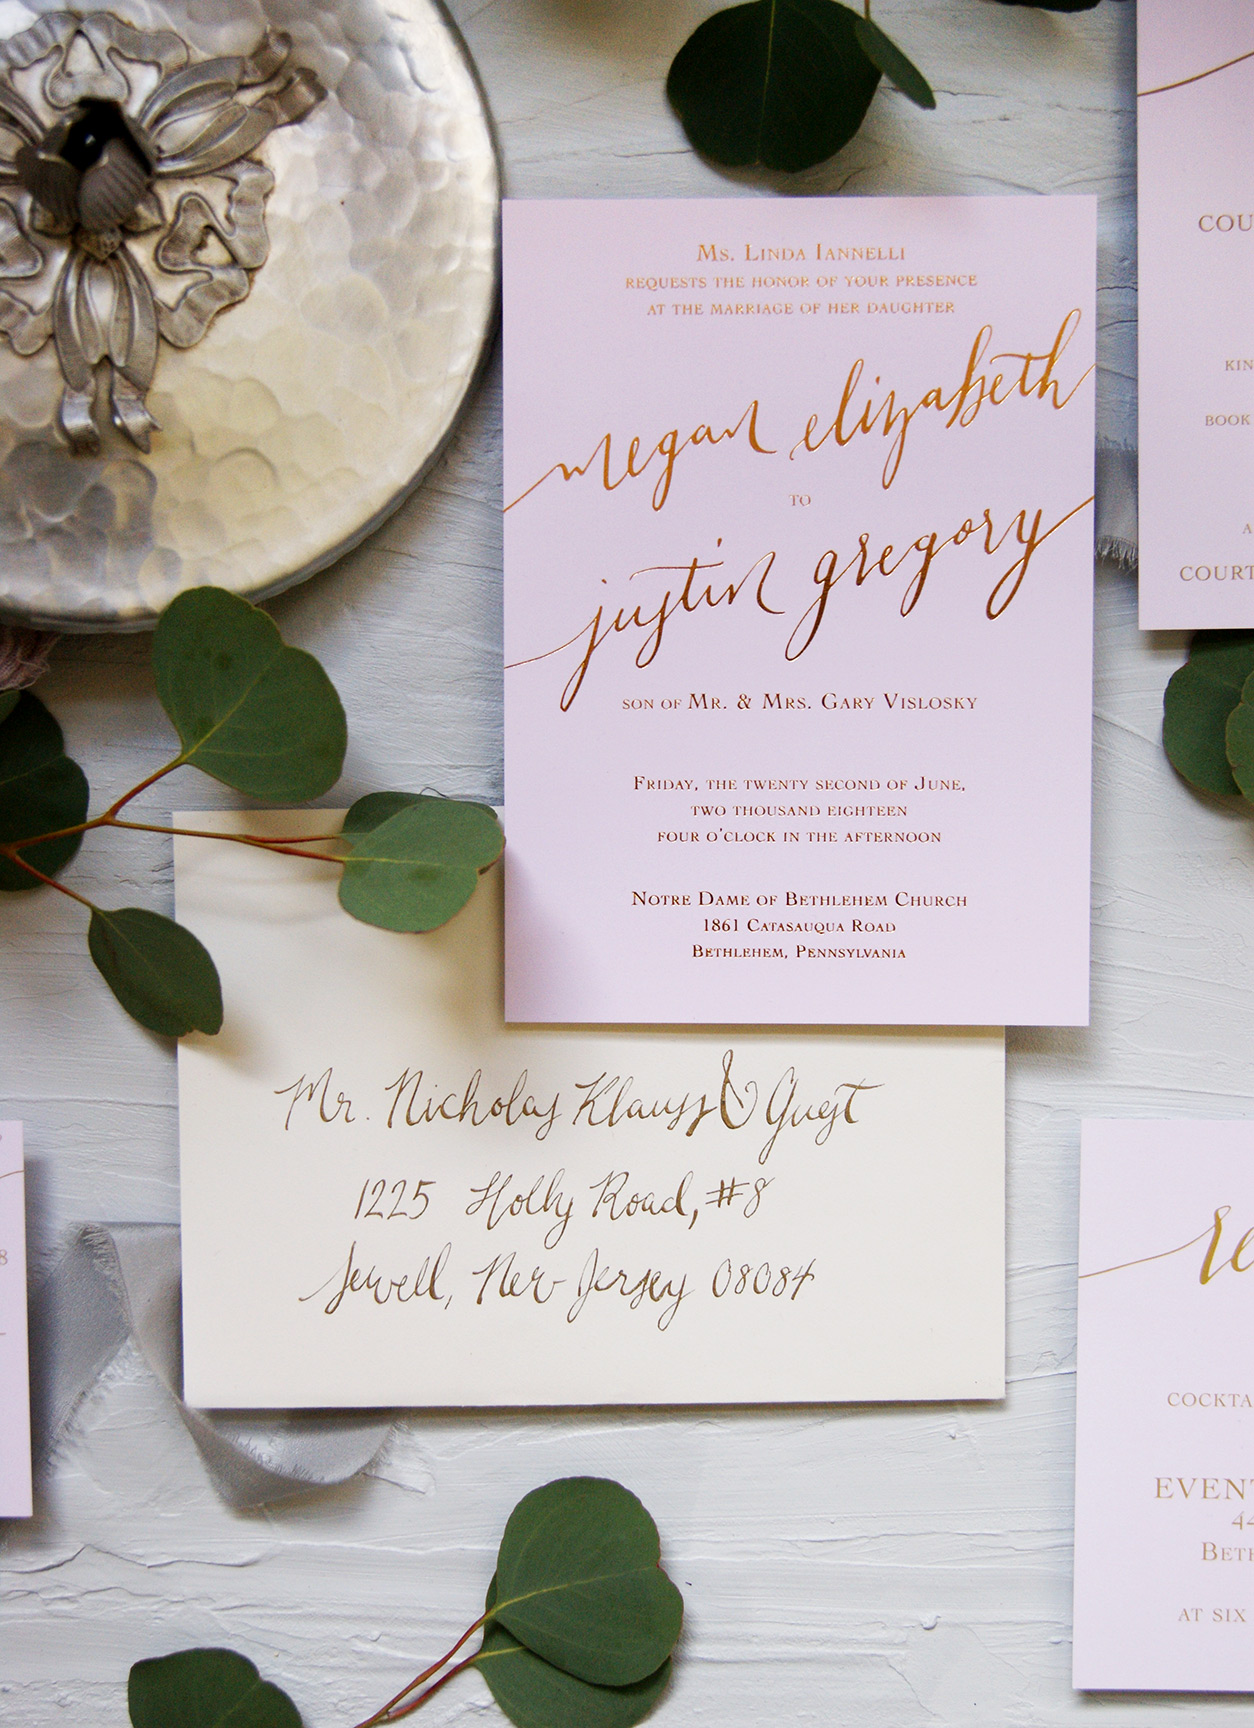 Blush-and-gold-custom-wedding-invite.jpg